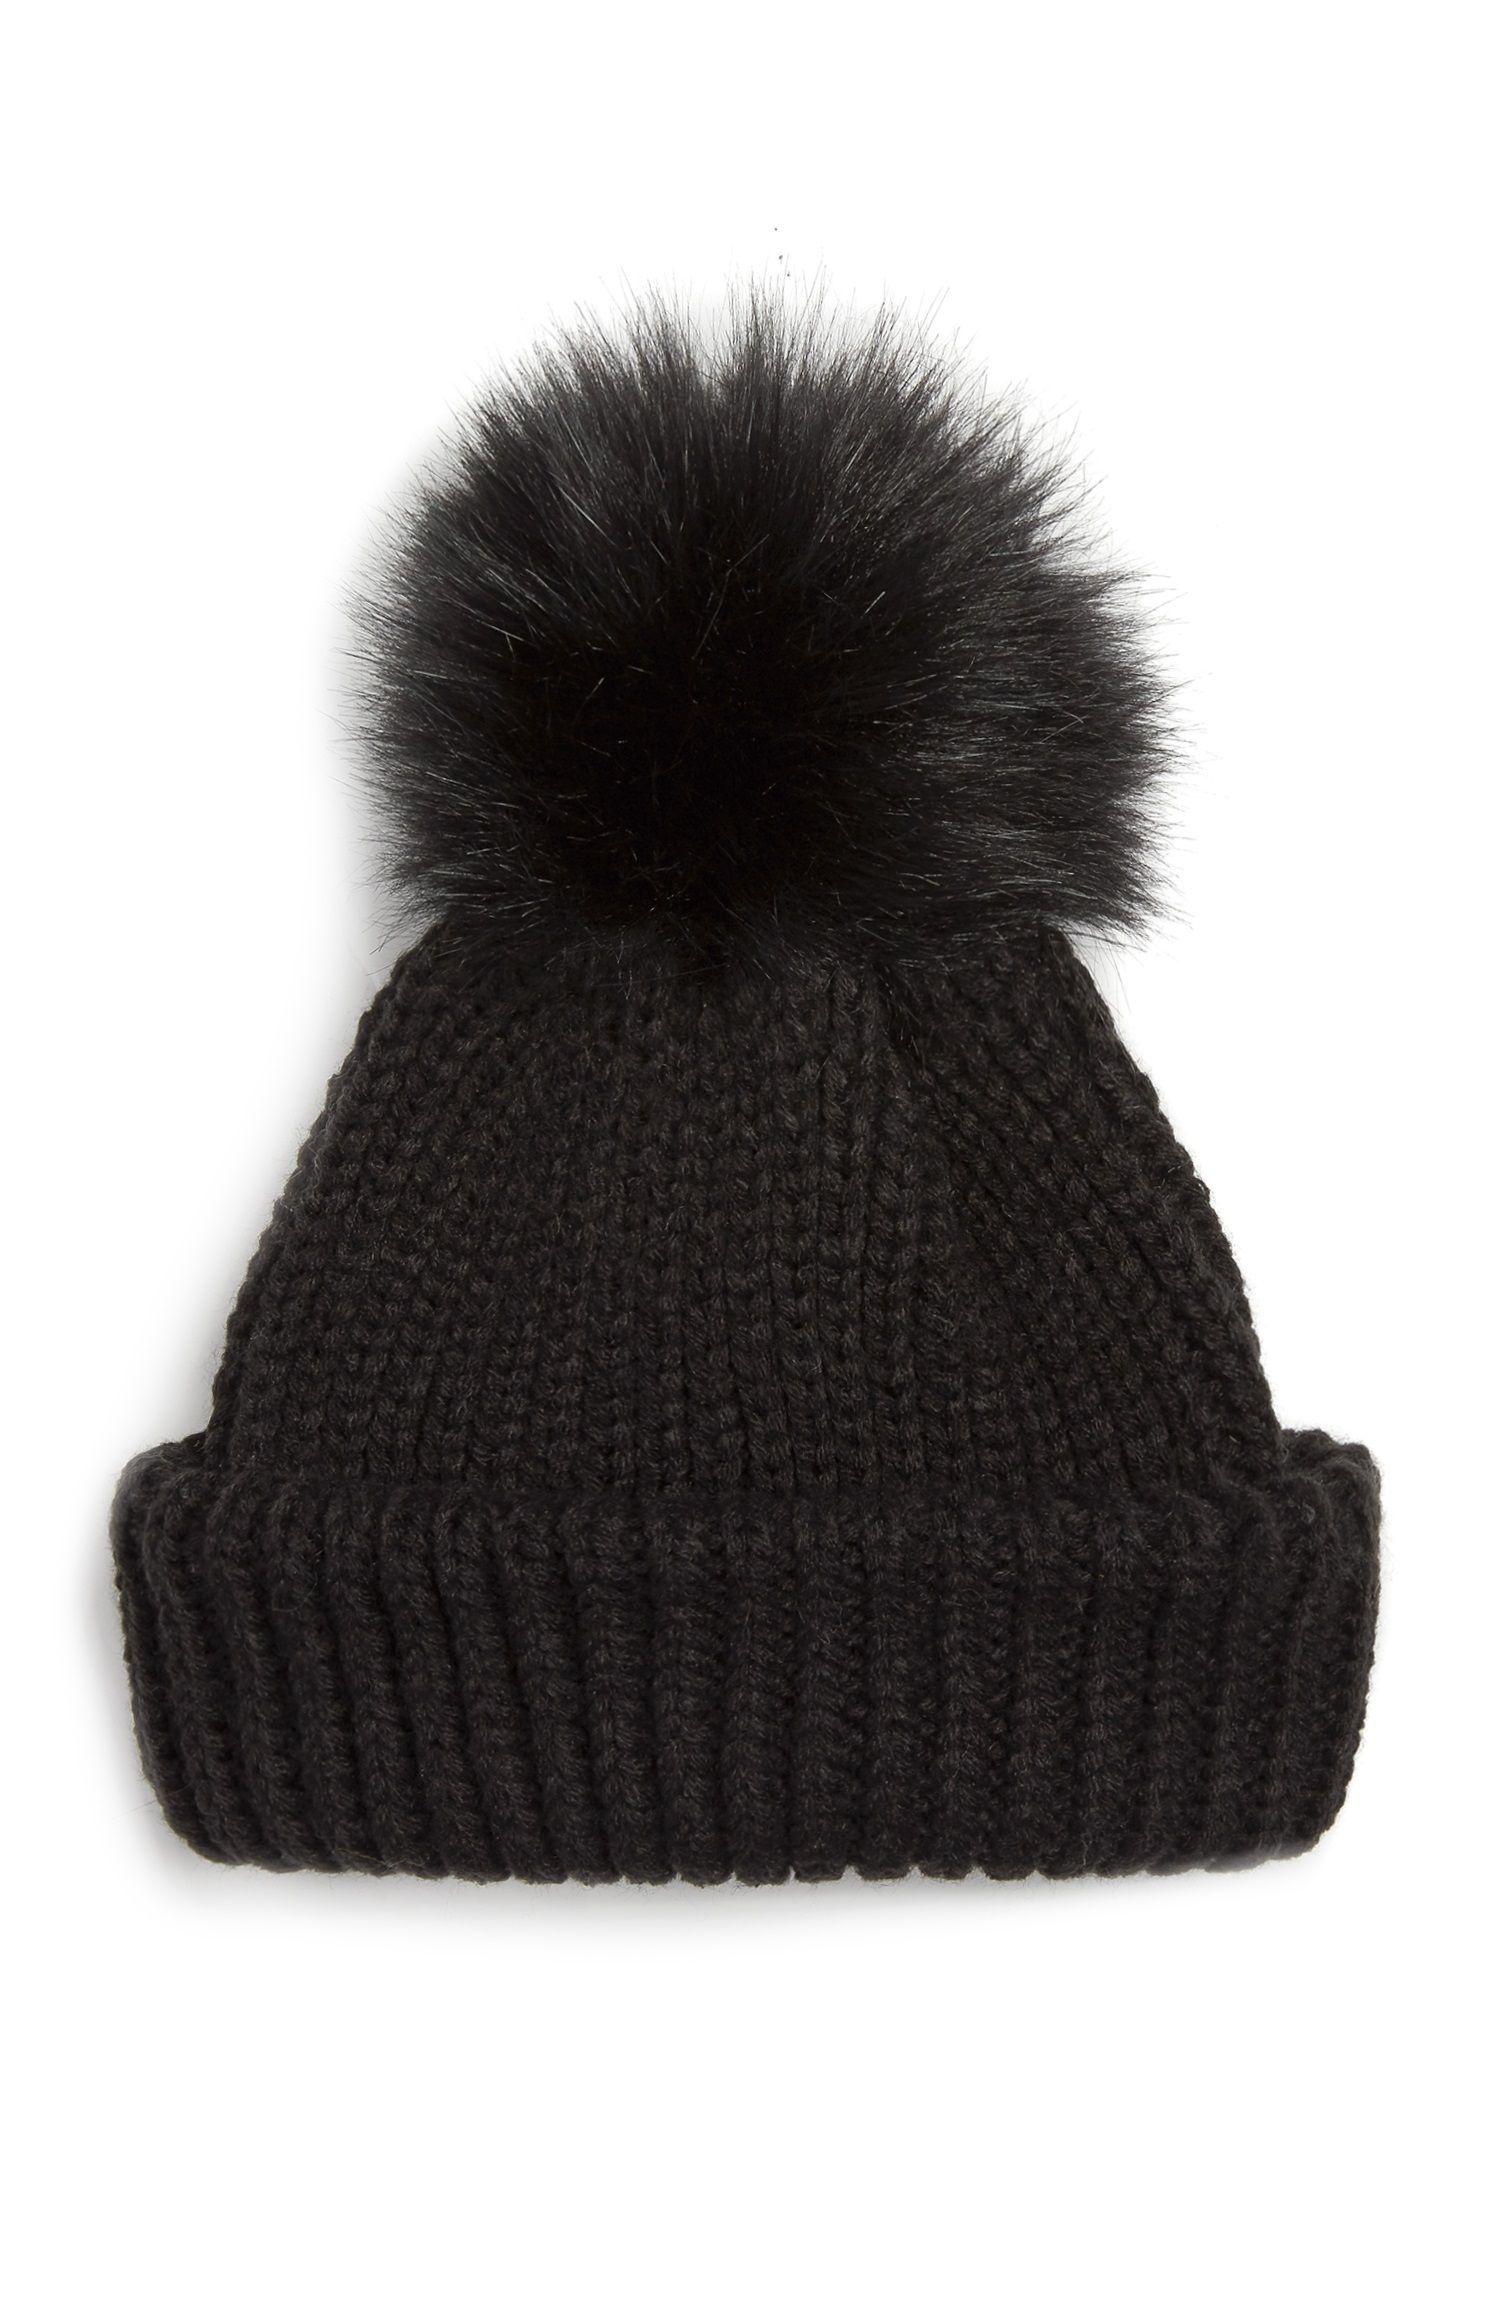 Primark - Black Faux Fur Ribbed Beanie  38d4b46883d